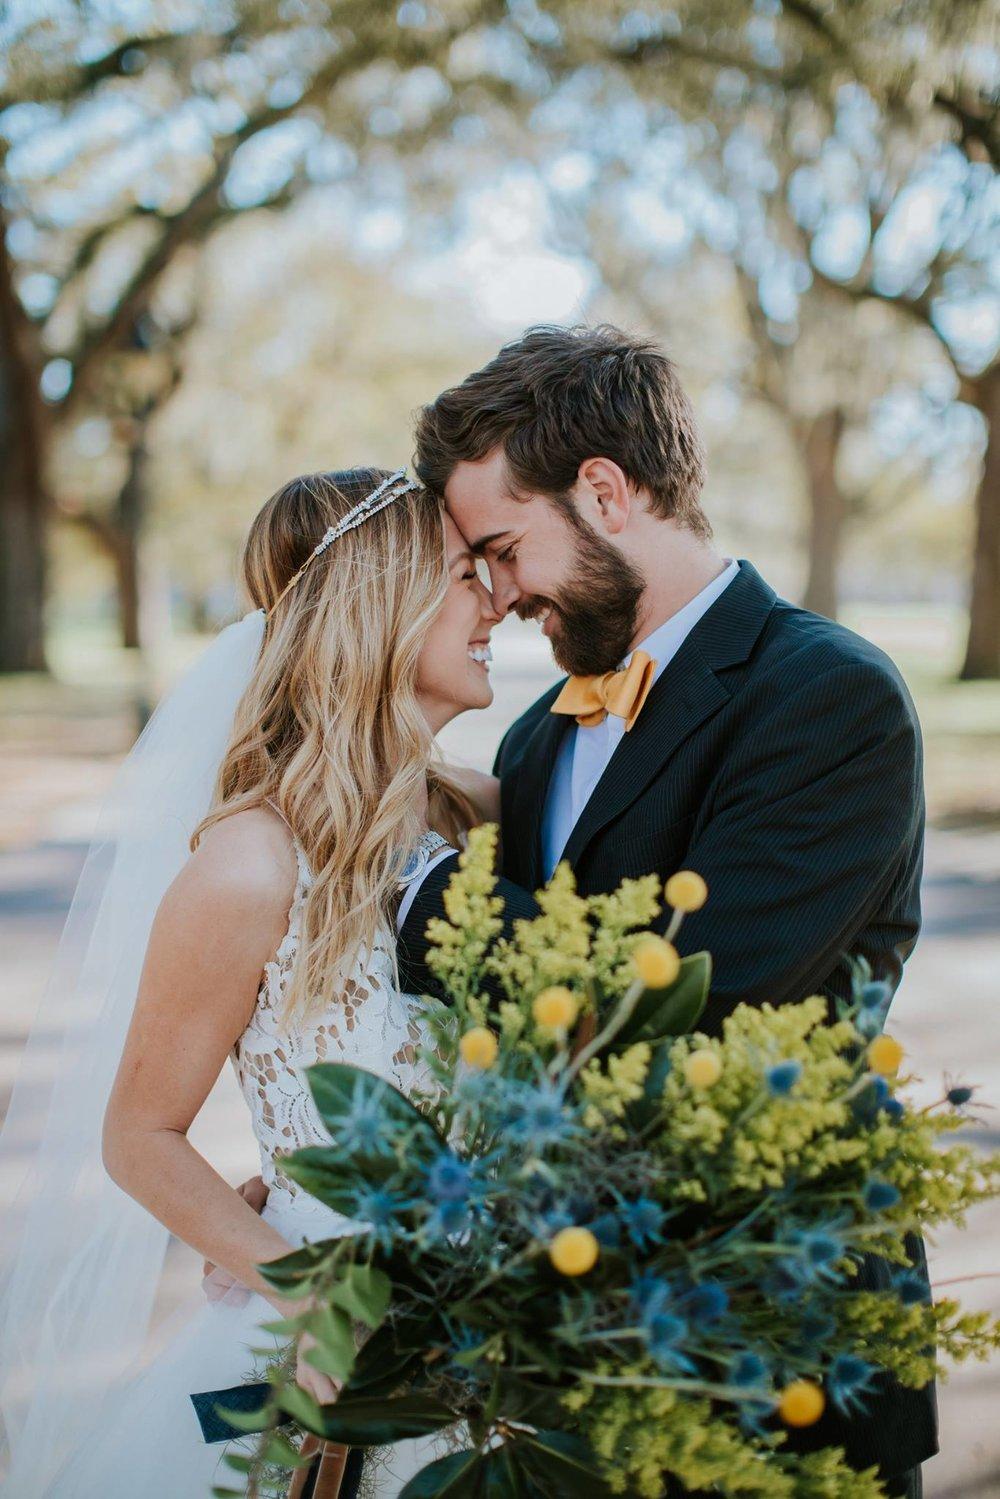 savannah-bridal-shop-five-reasons-to-have-a-fall-wedding-in-savannah-heather-skye-phototgraphy-blush-by-hayley-paige-fall-wedding-trends-12.jpg